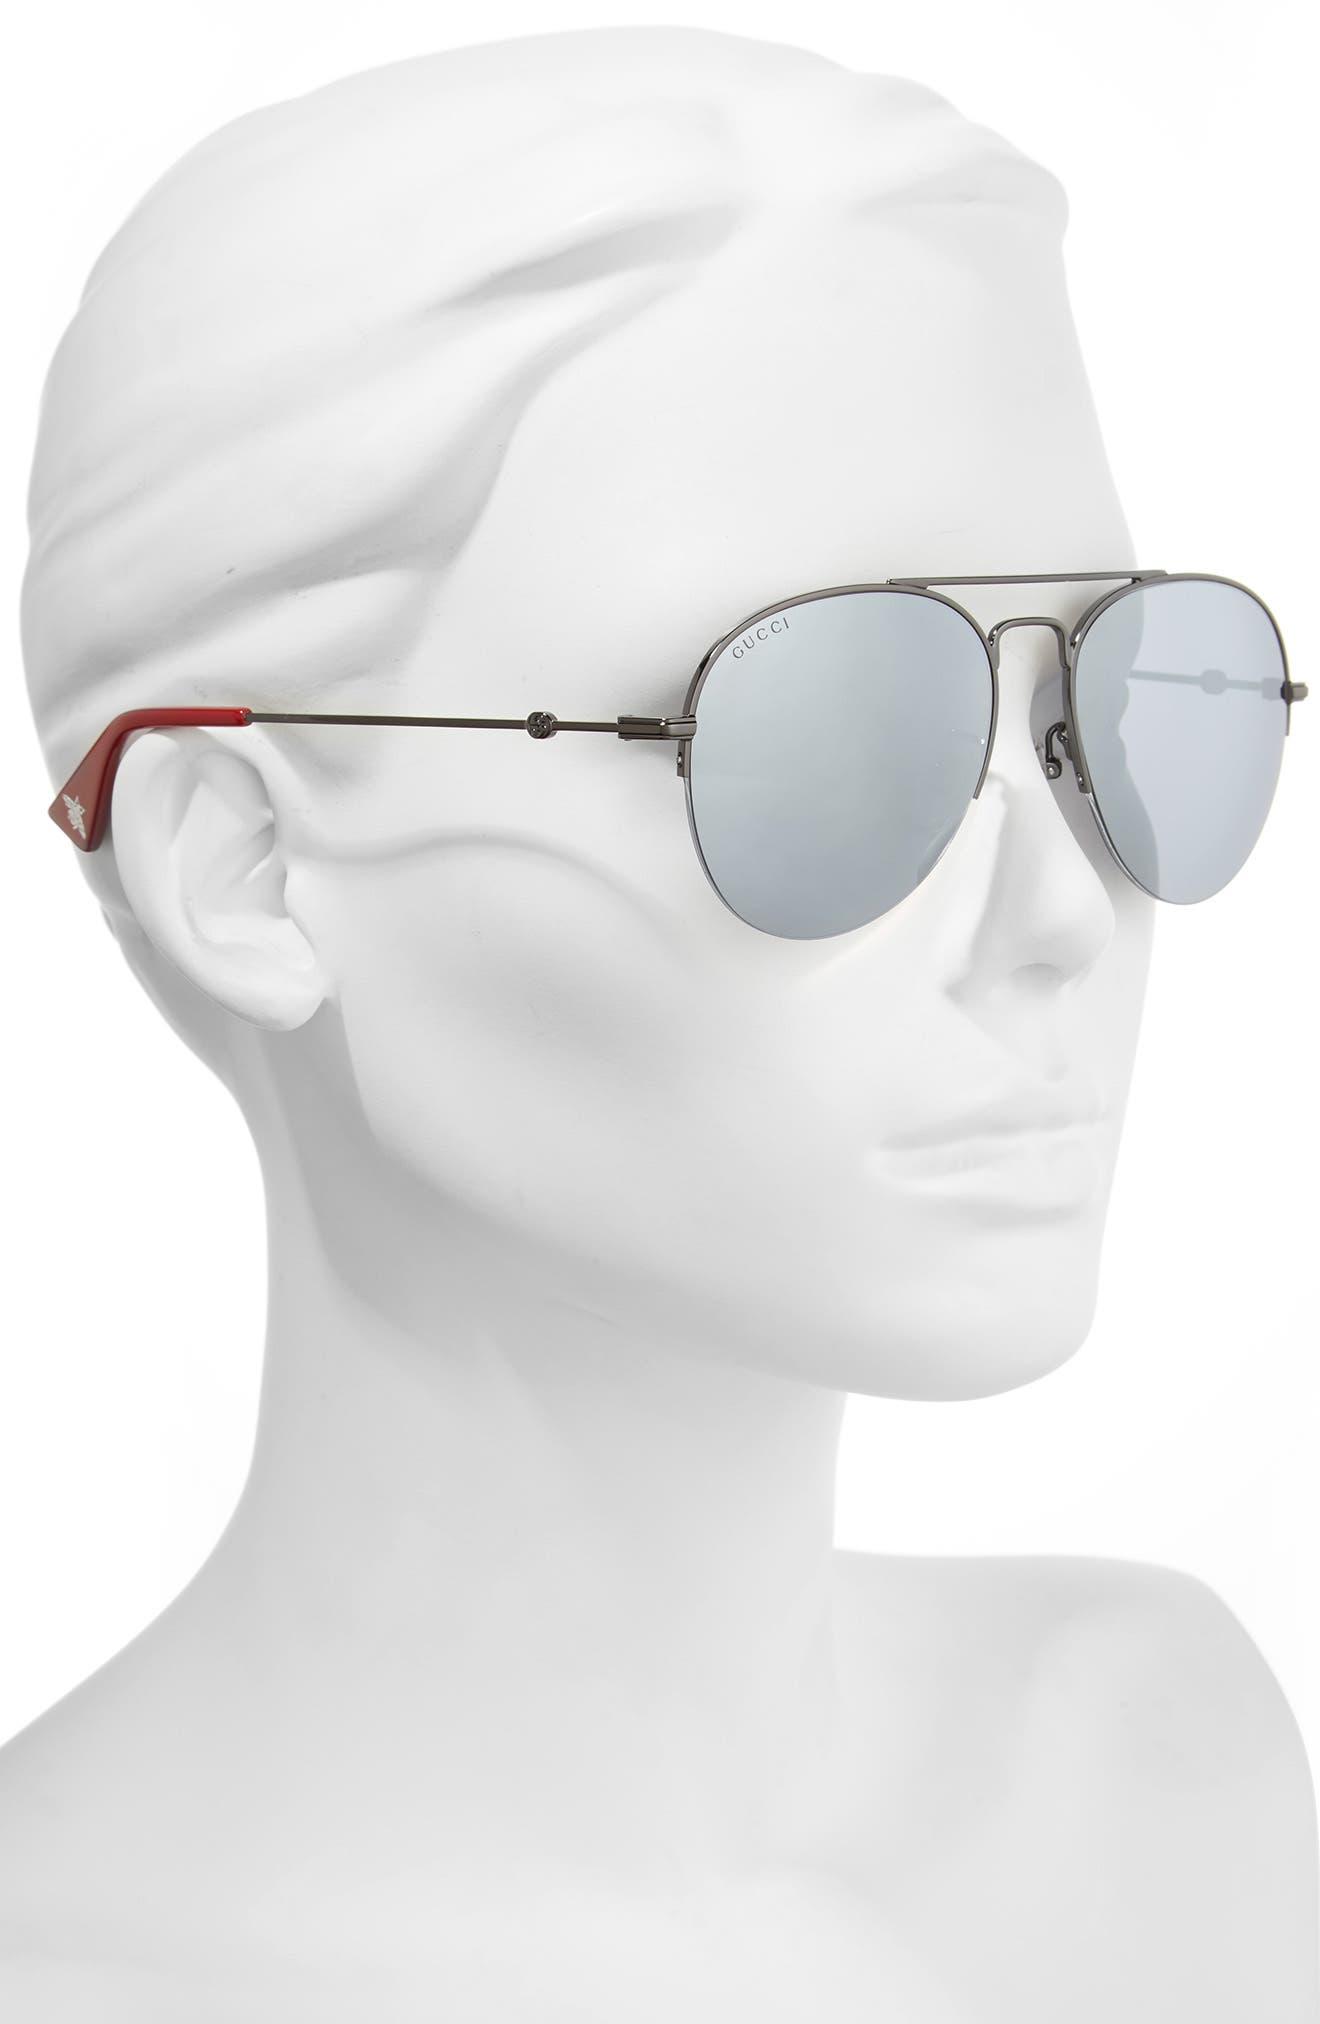 56mm Aviator Sunglasses,                             Alternate thumbnail 2, color,                             Ruthenium/ Silver